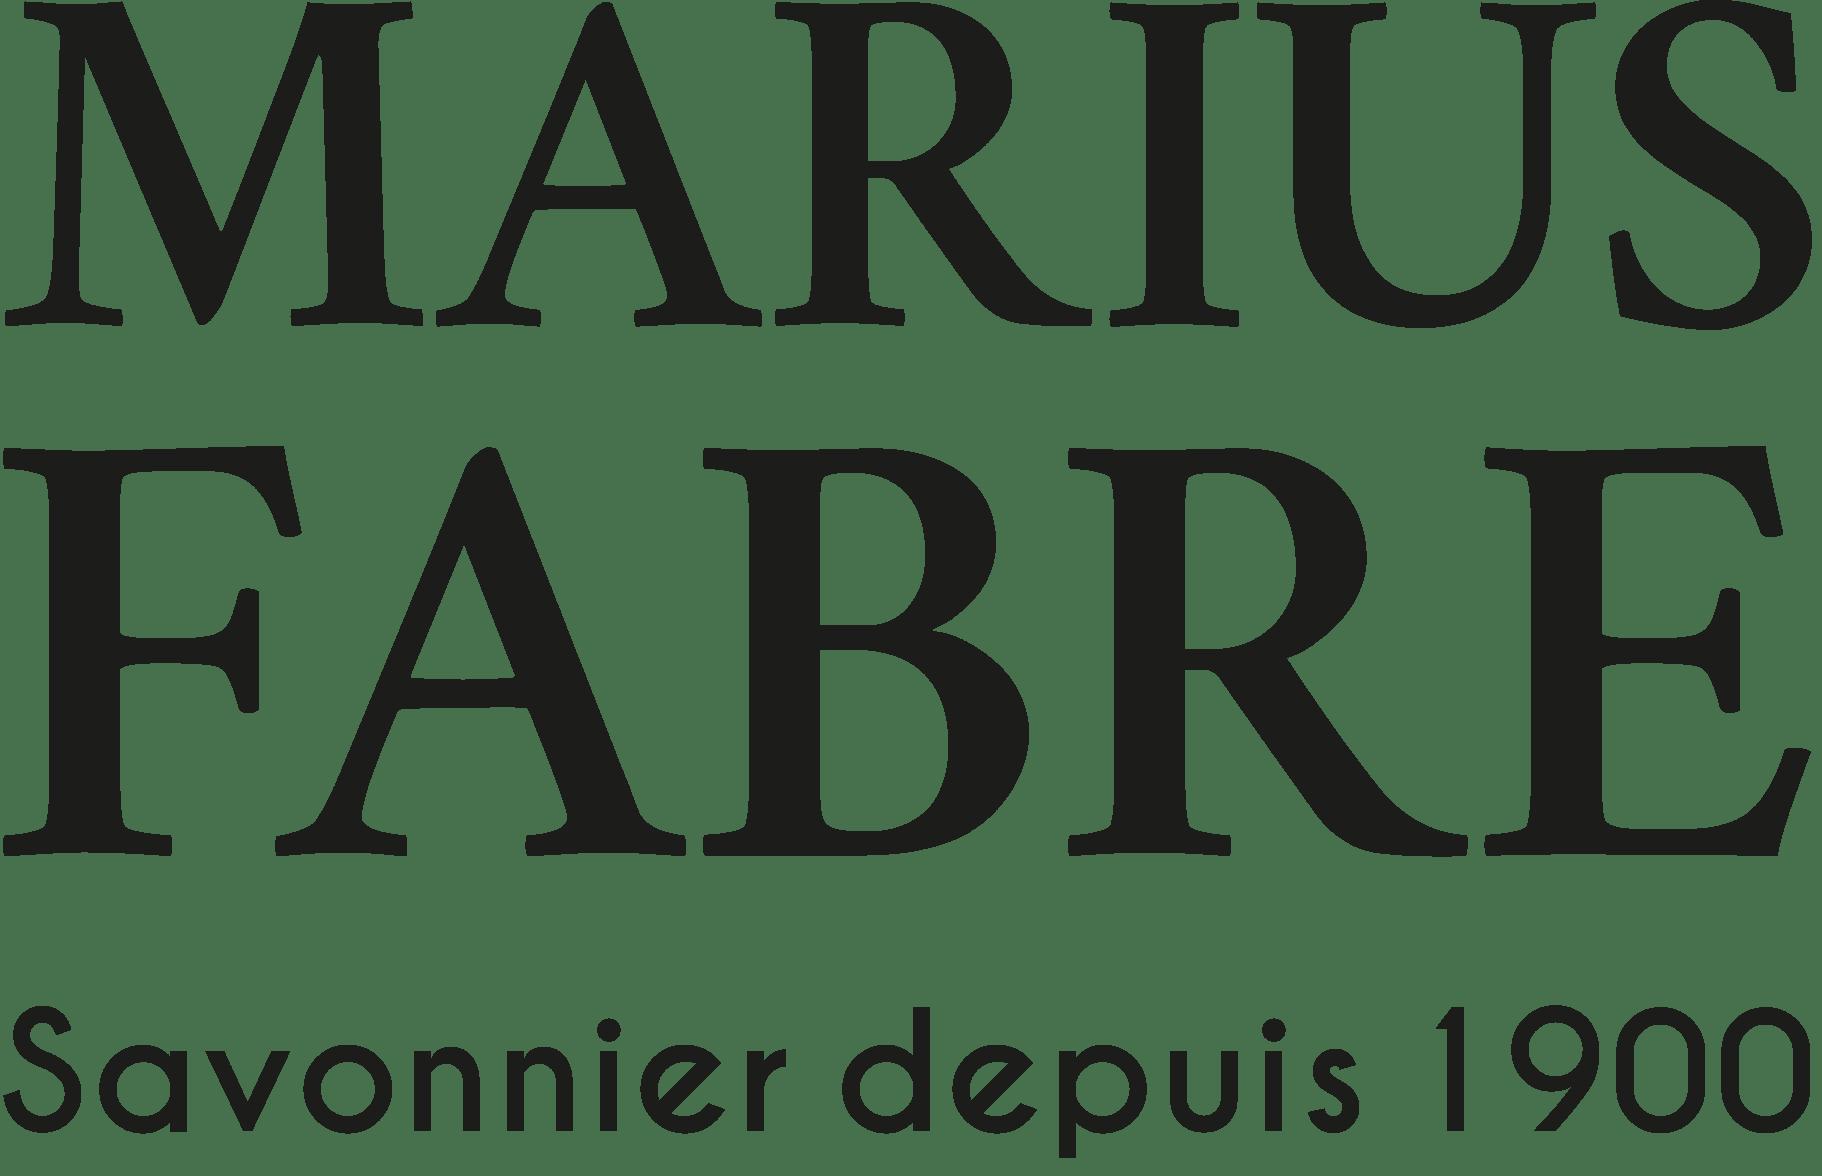 https://www.marques-de-france.fr/wp-content/uploads/2019/03/Logo_MariusFabre_Carre.png